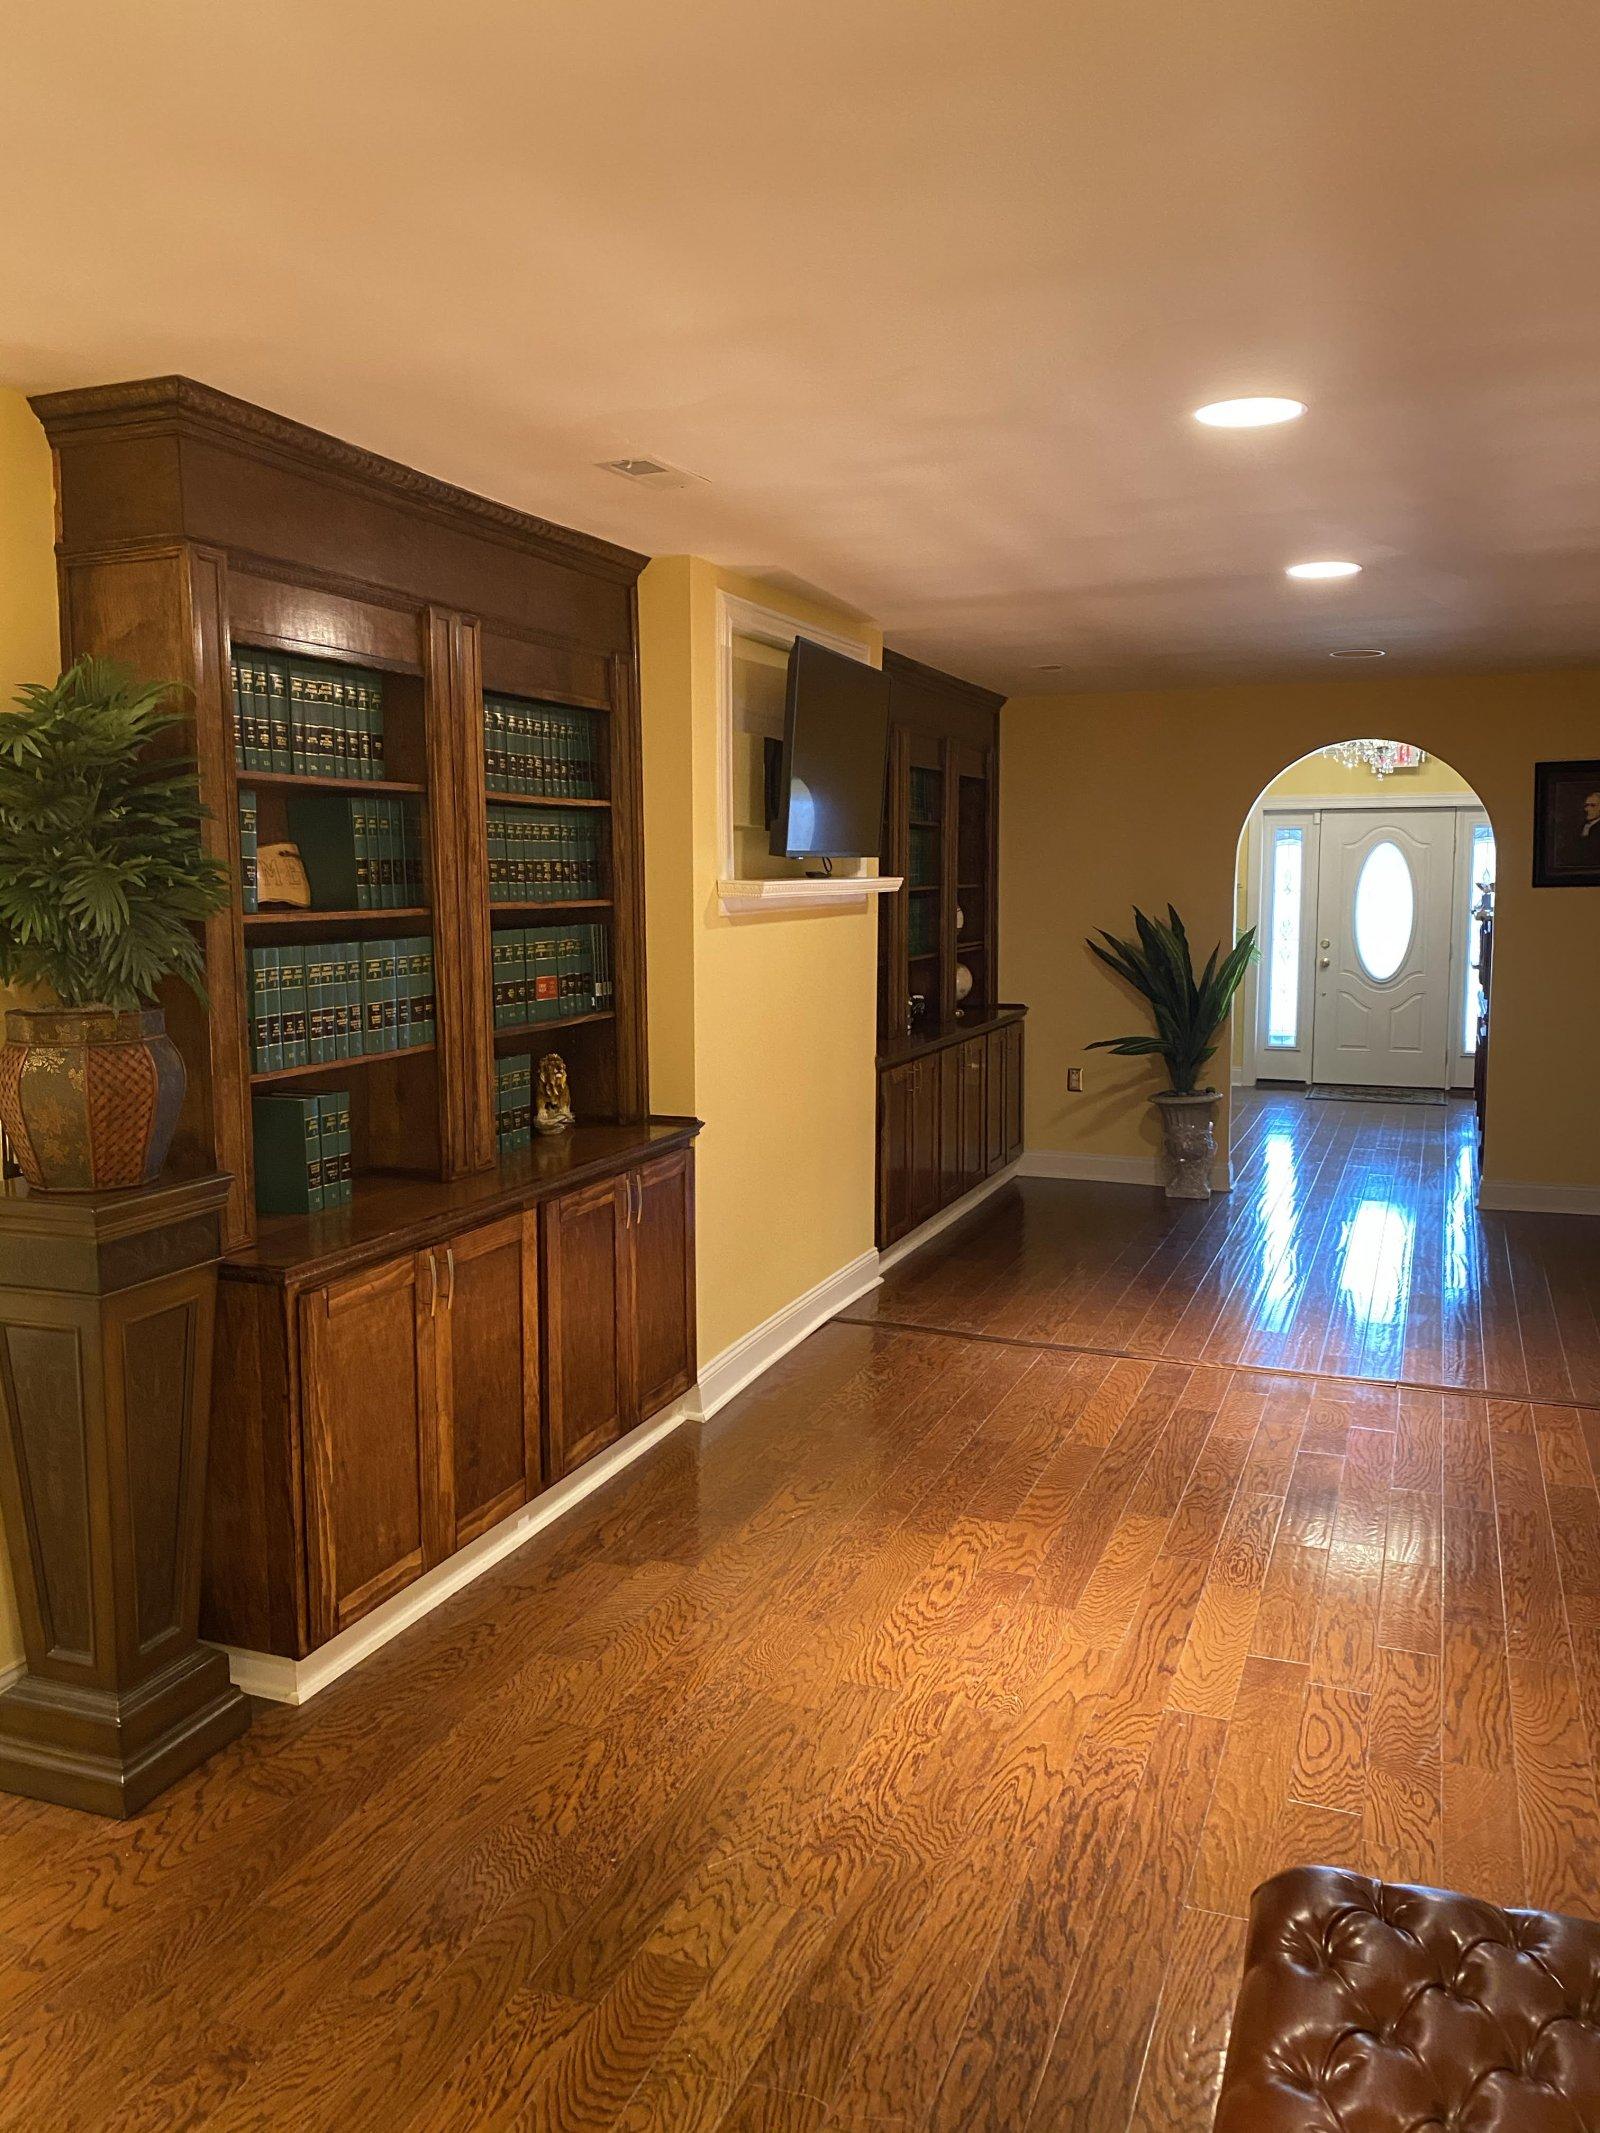 Linward interior 8